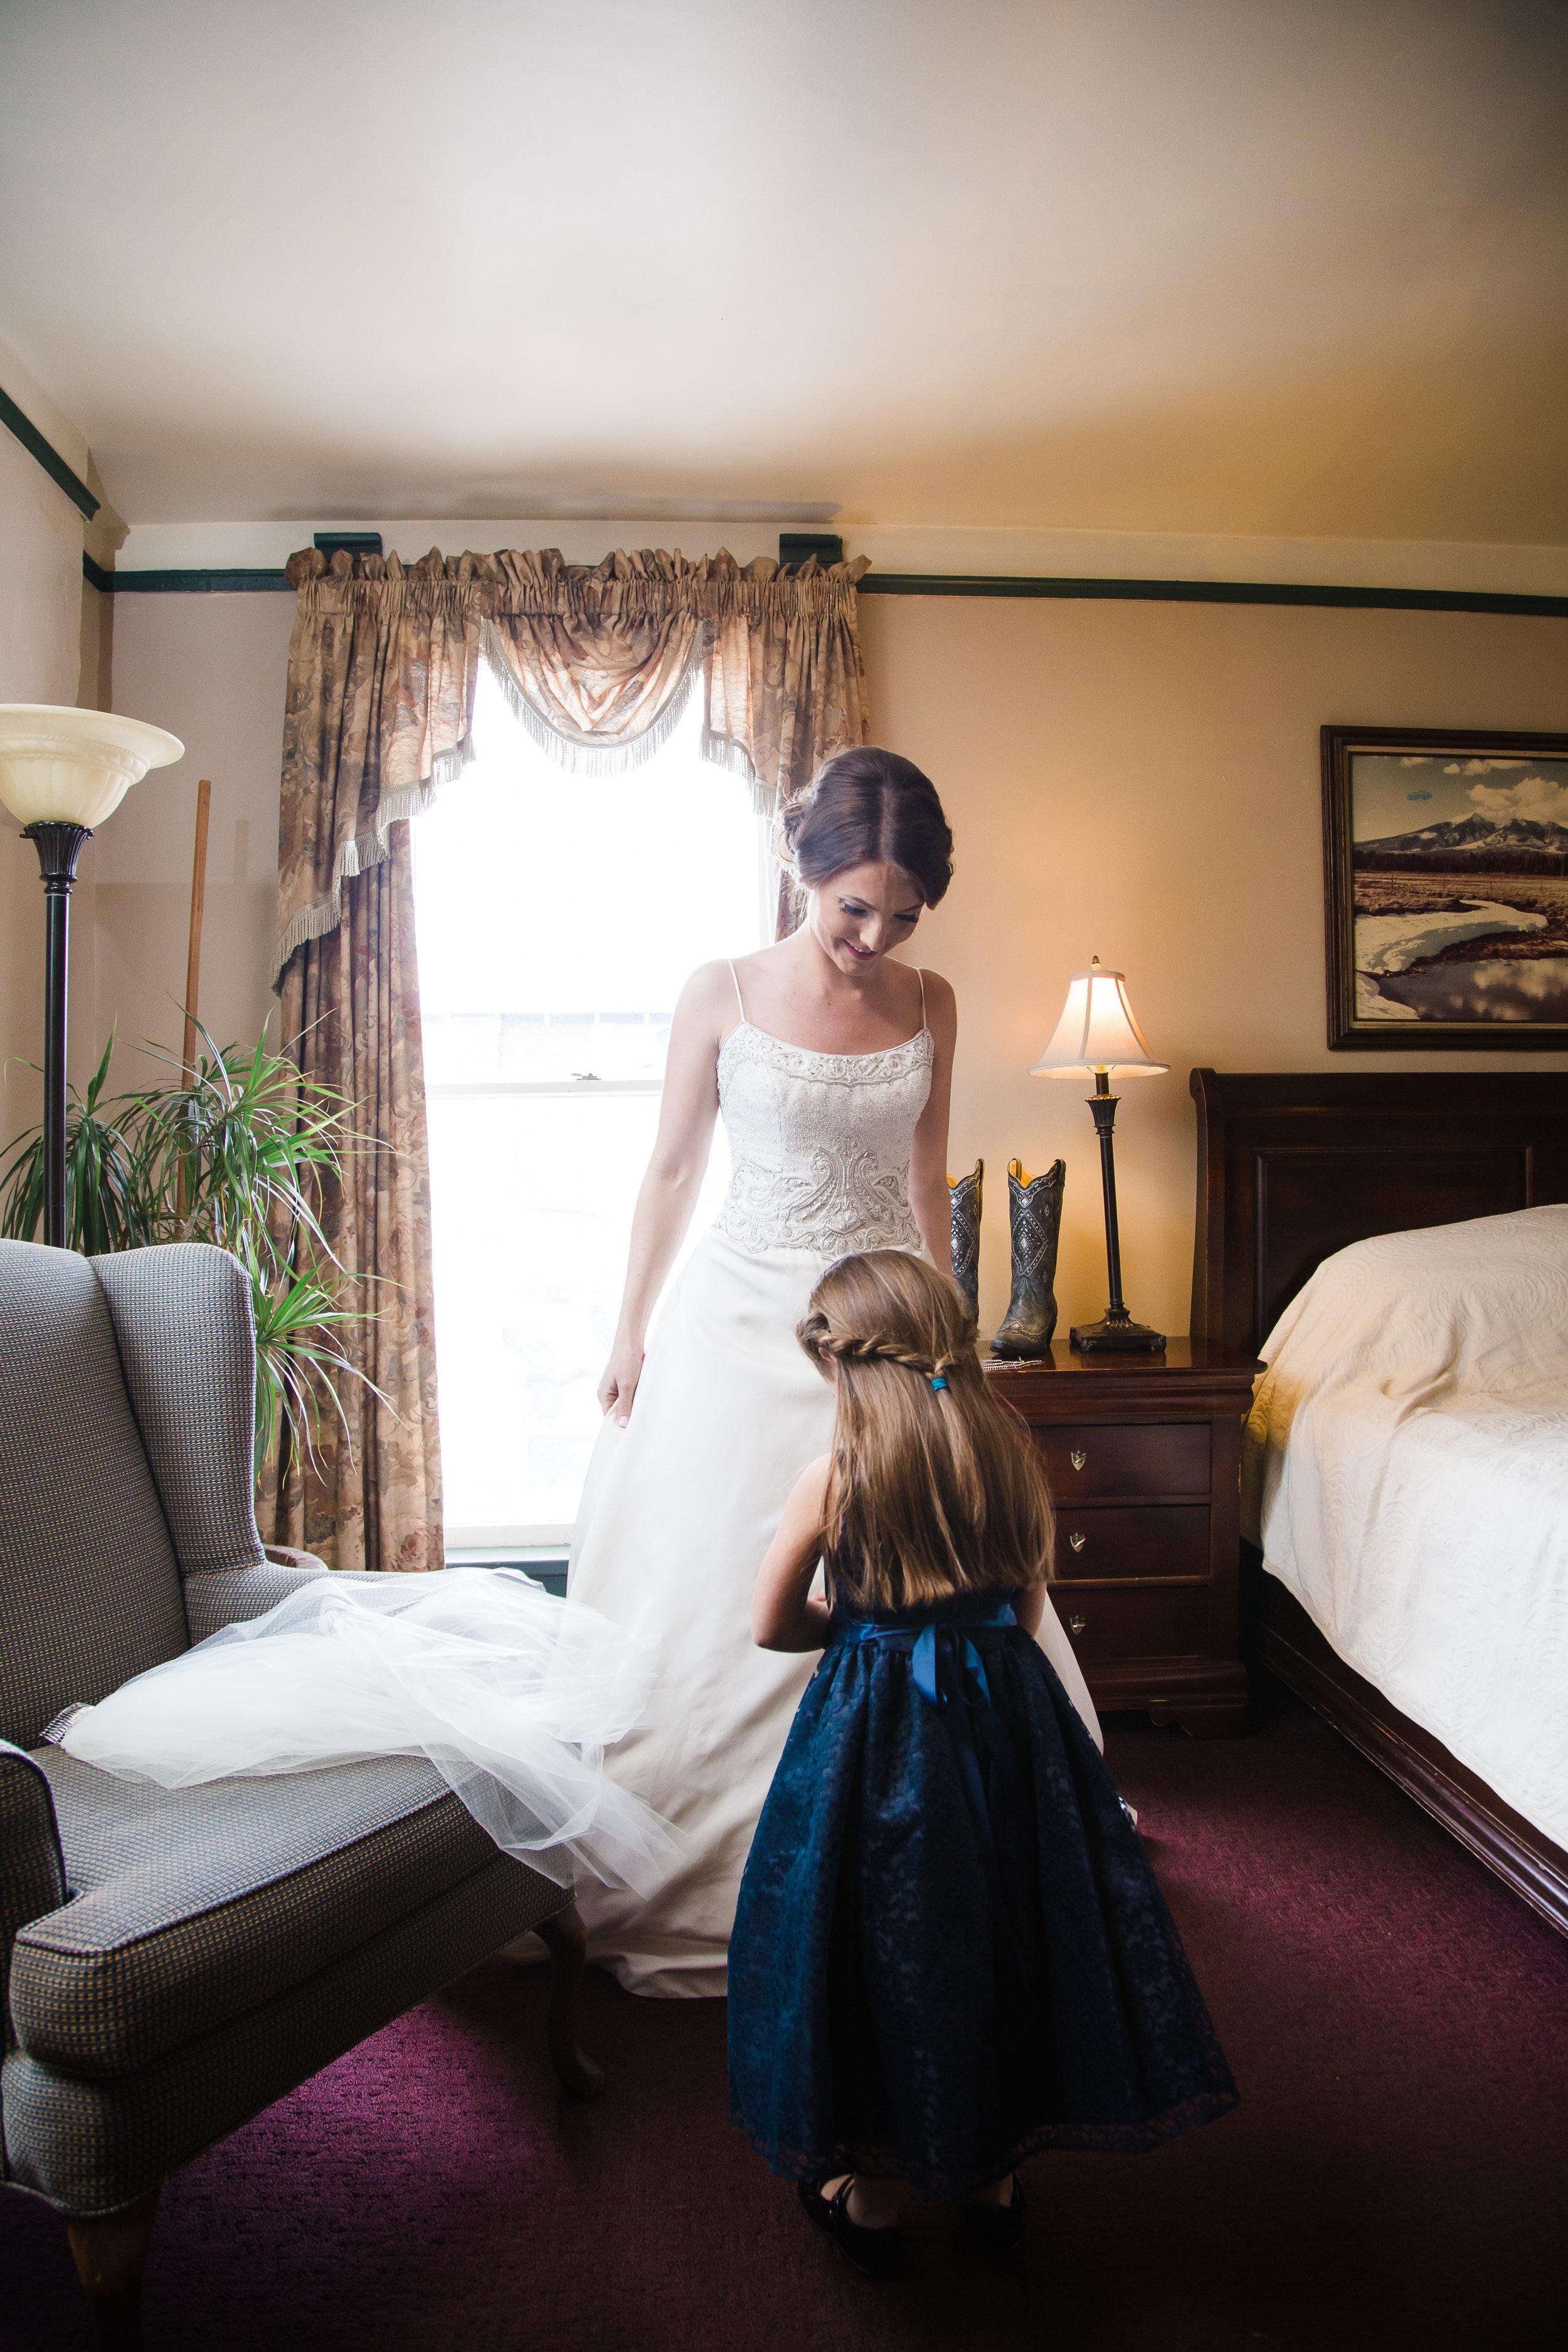 Flagstaff wedding photographer, Weatherford Hotel wedding